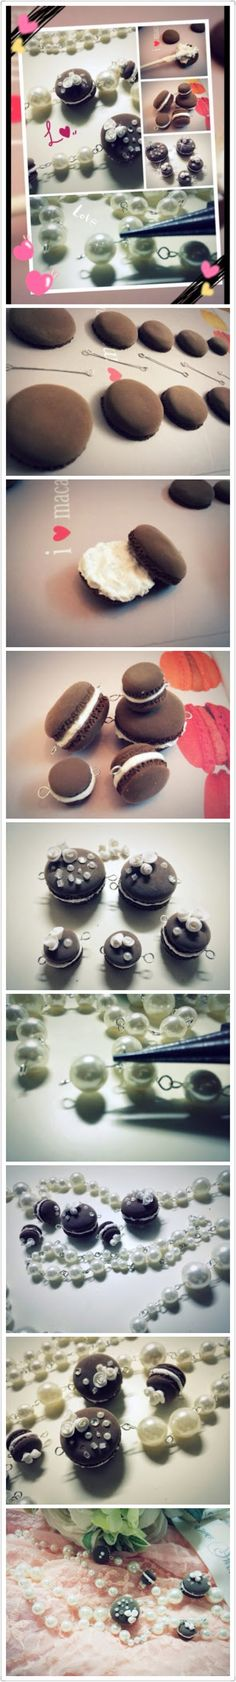 http://siusally.blogspot.hk/2014/02/salleeenecklace-chocolate-macaroon.html?m=1